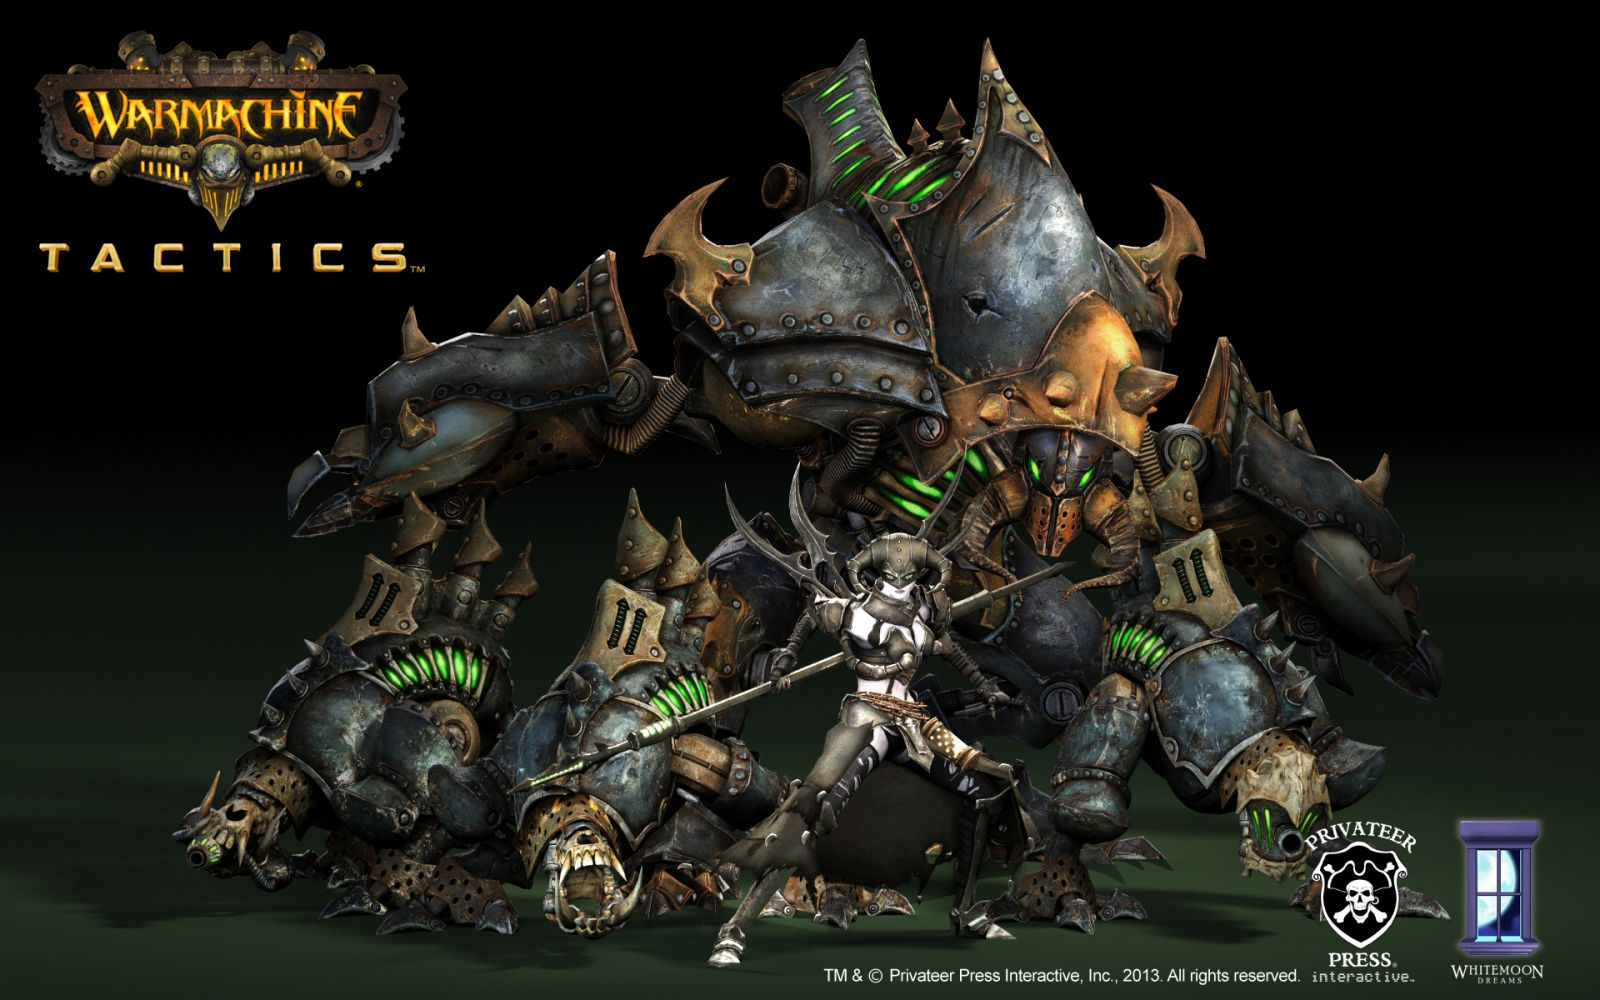 Демо-версия Warmachine: Tactics вышла в Steam